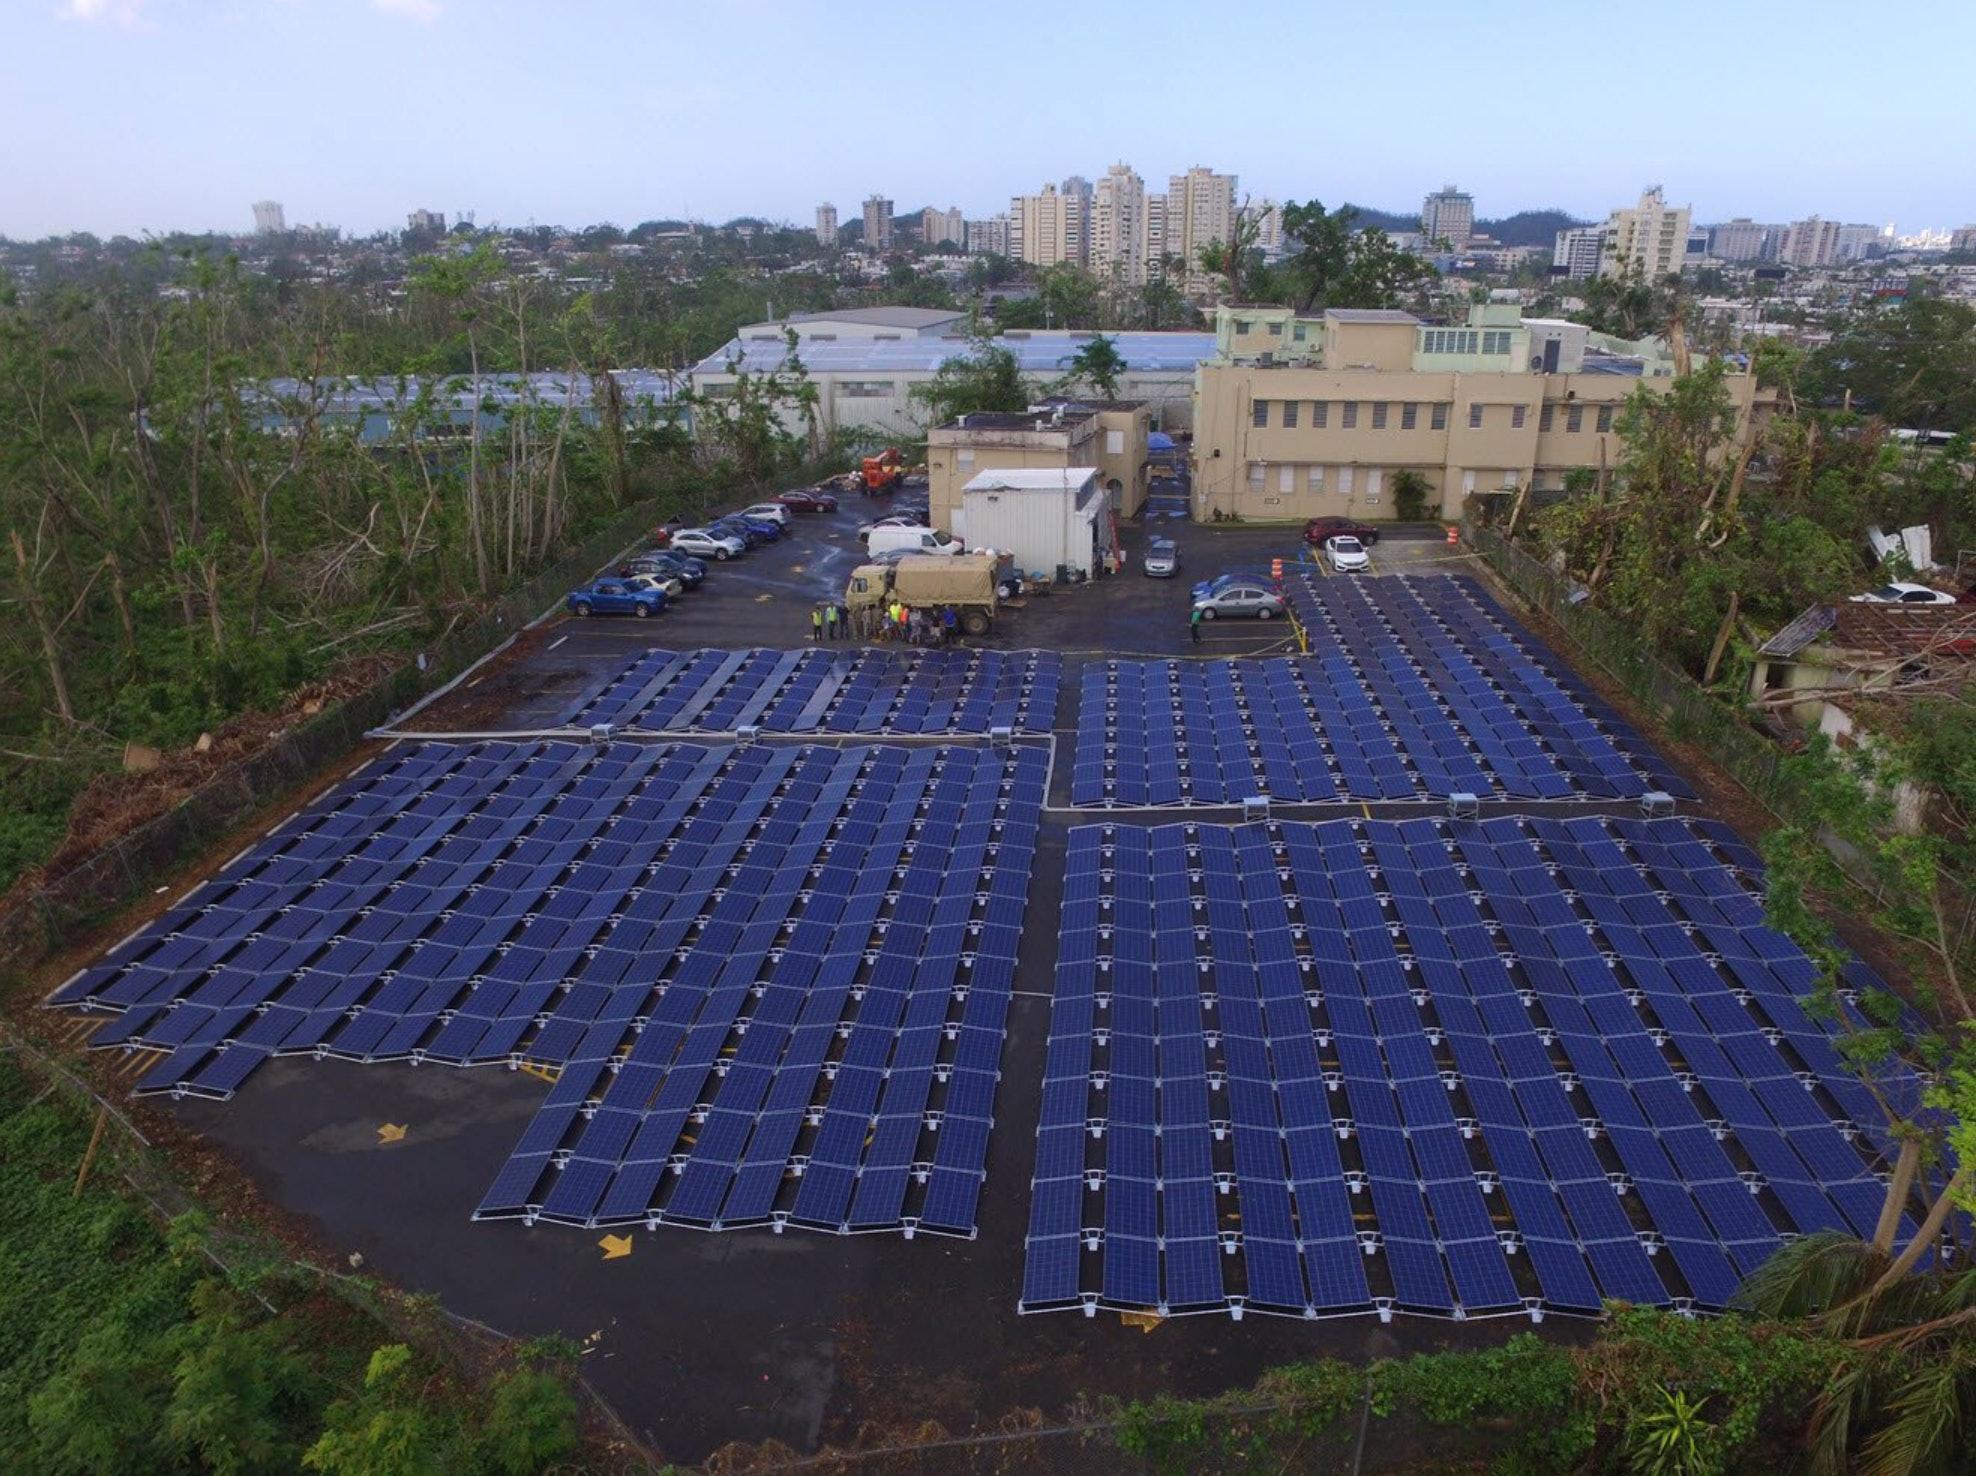 Tesla solar panel project.